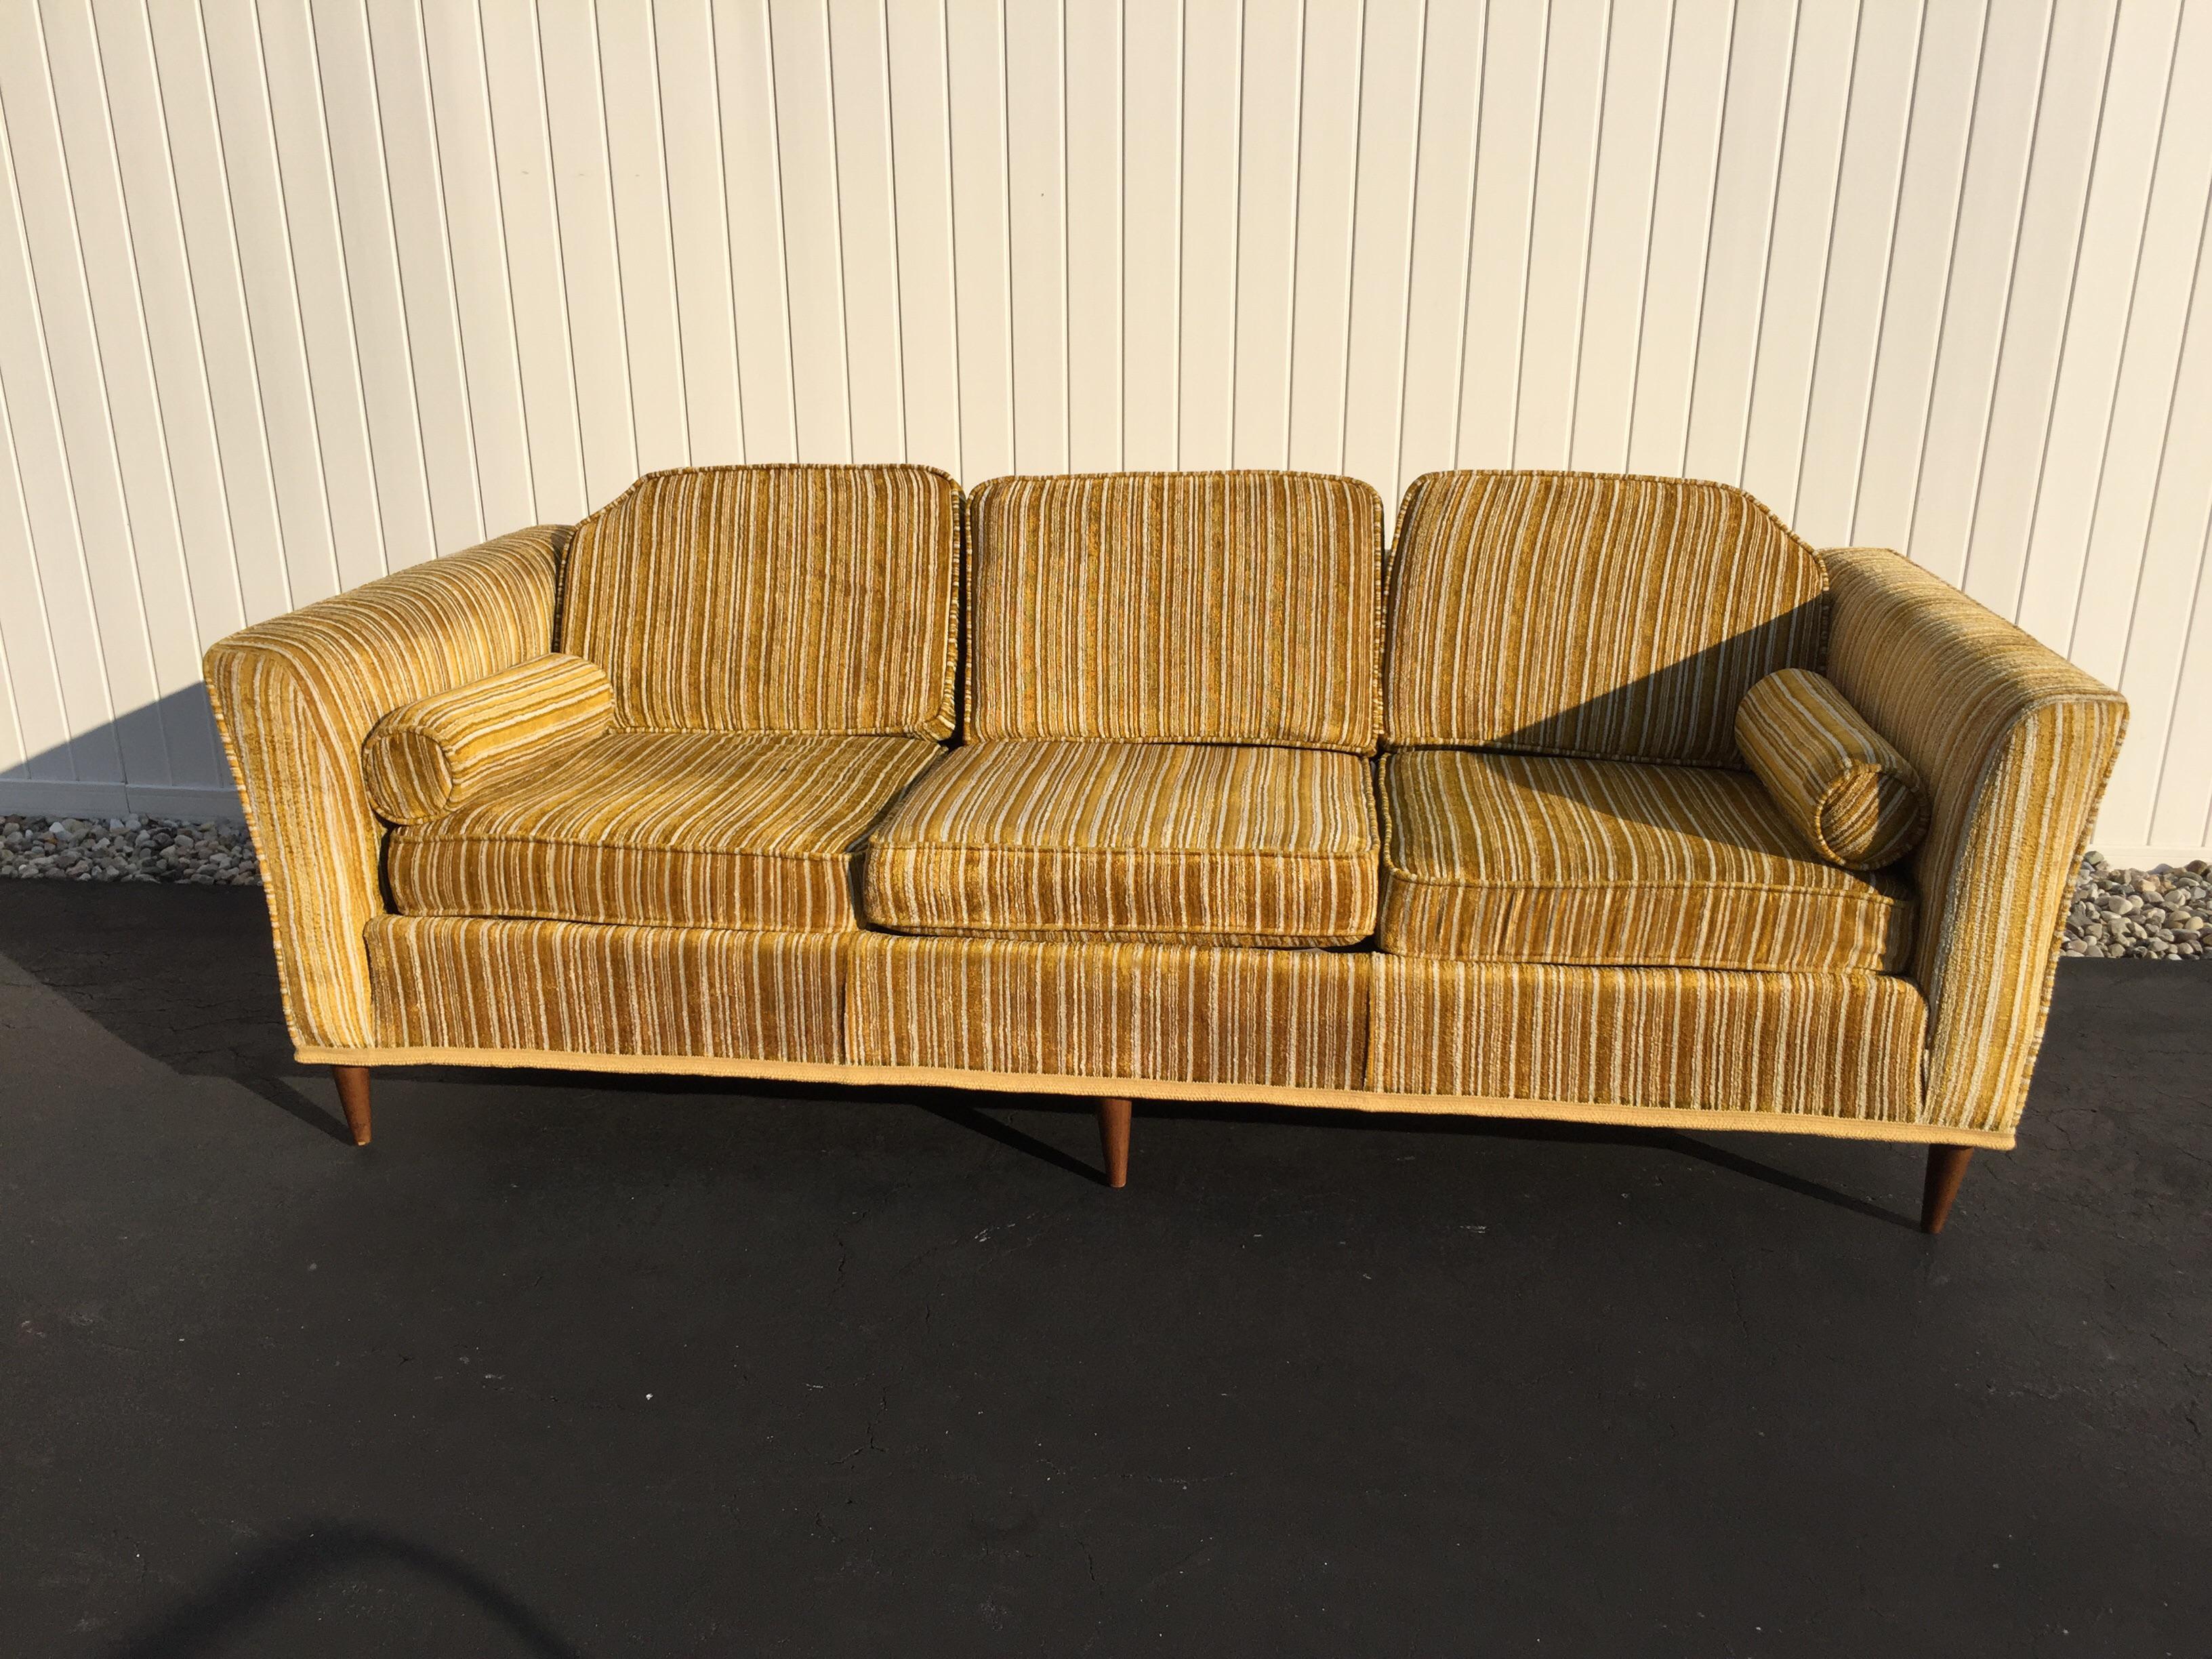 Kroehler Royale Mid Century Gold Striped Sofa   Image 2 Of 11